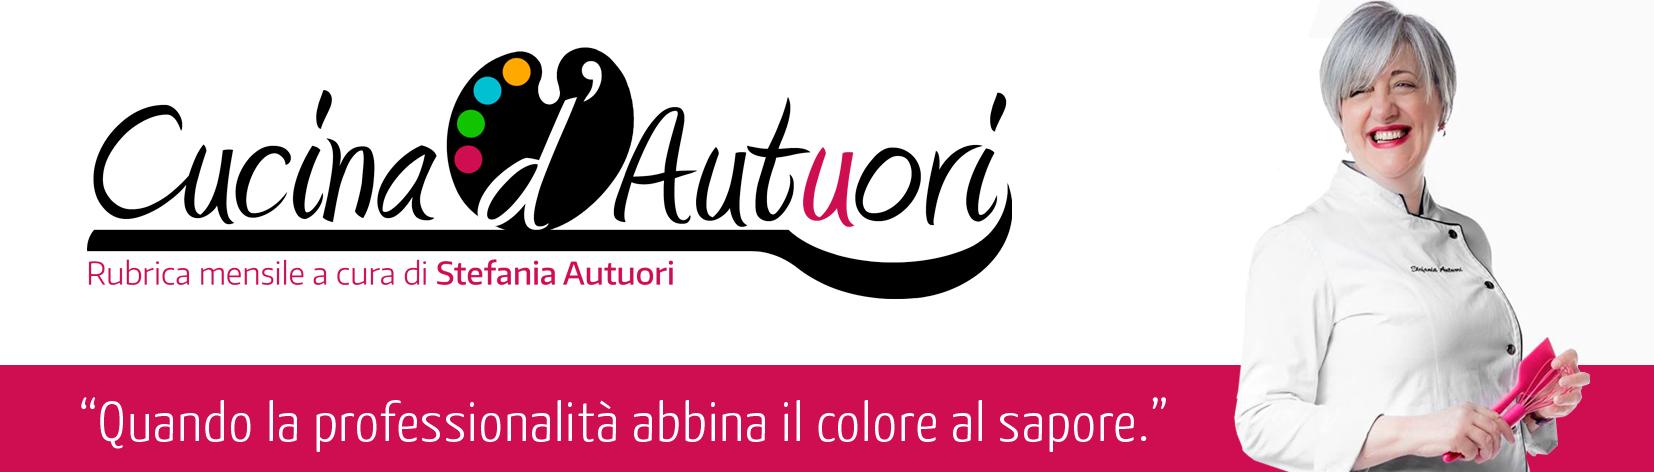 banner_AUTUORI